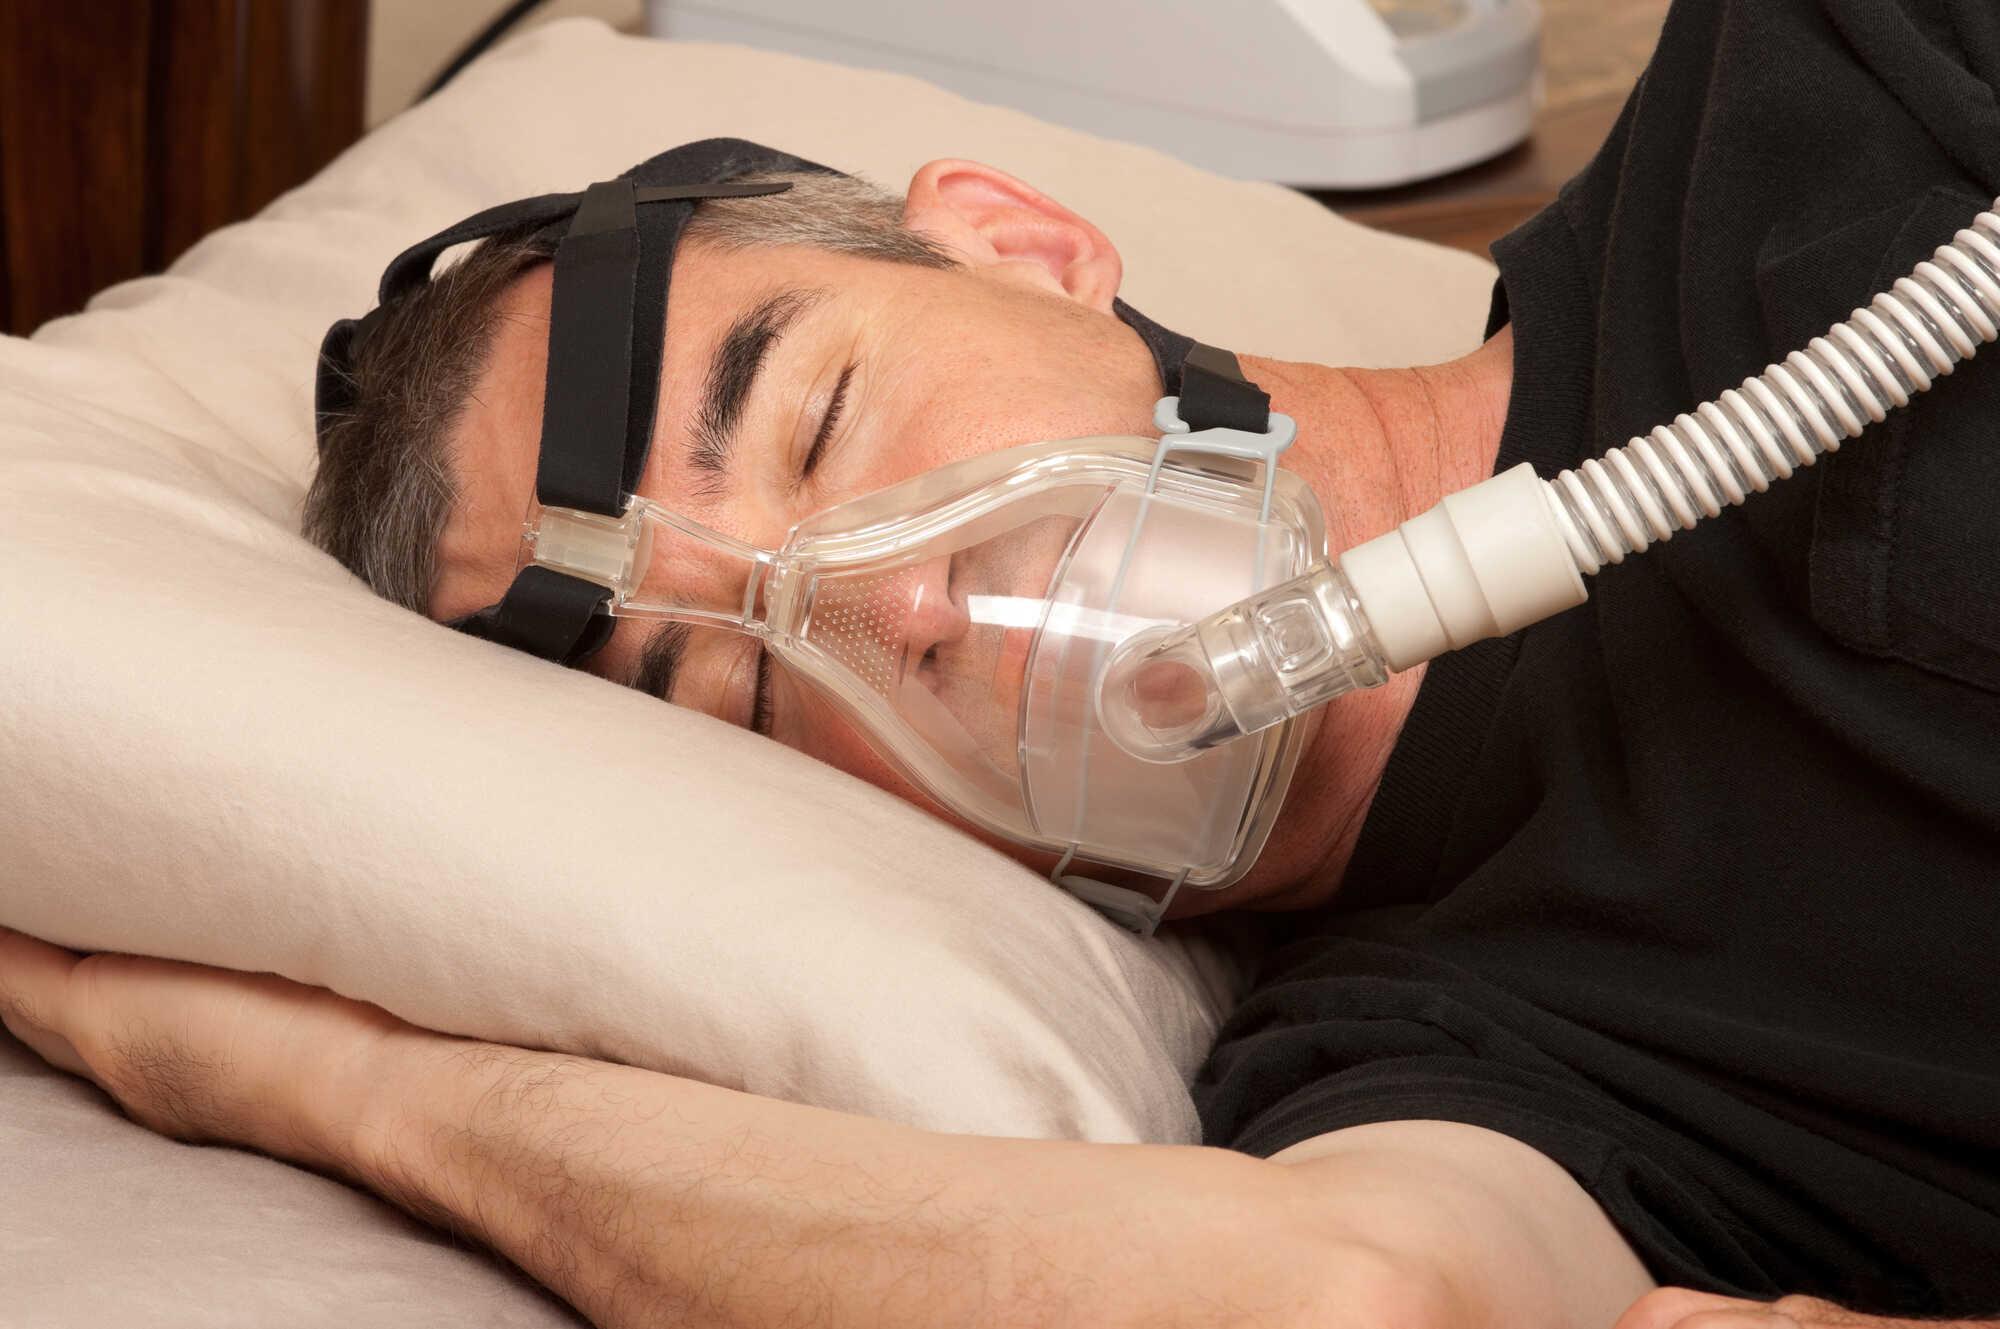 Co je to spánková apnoe?